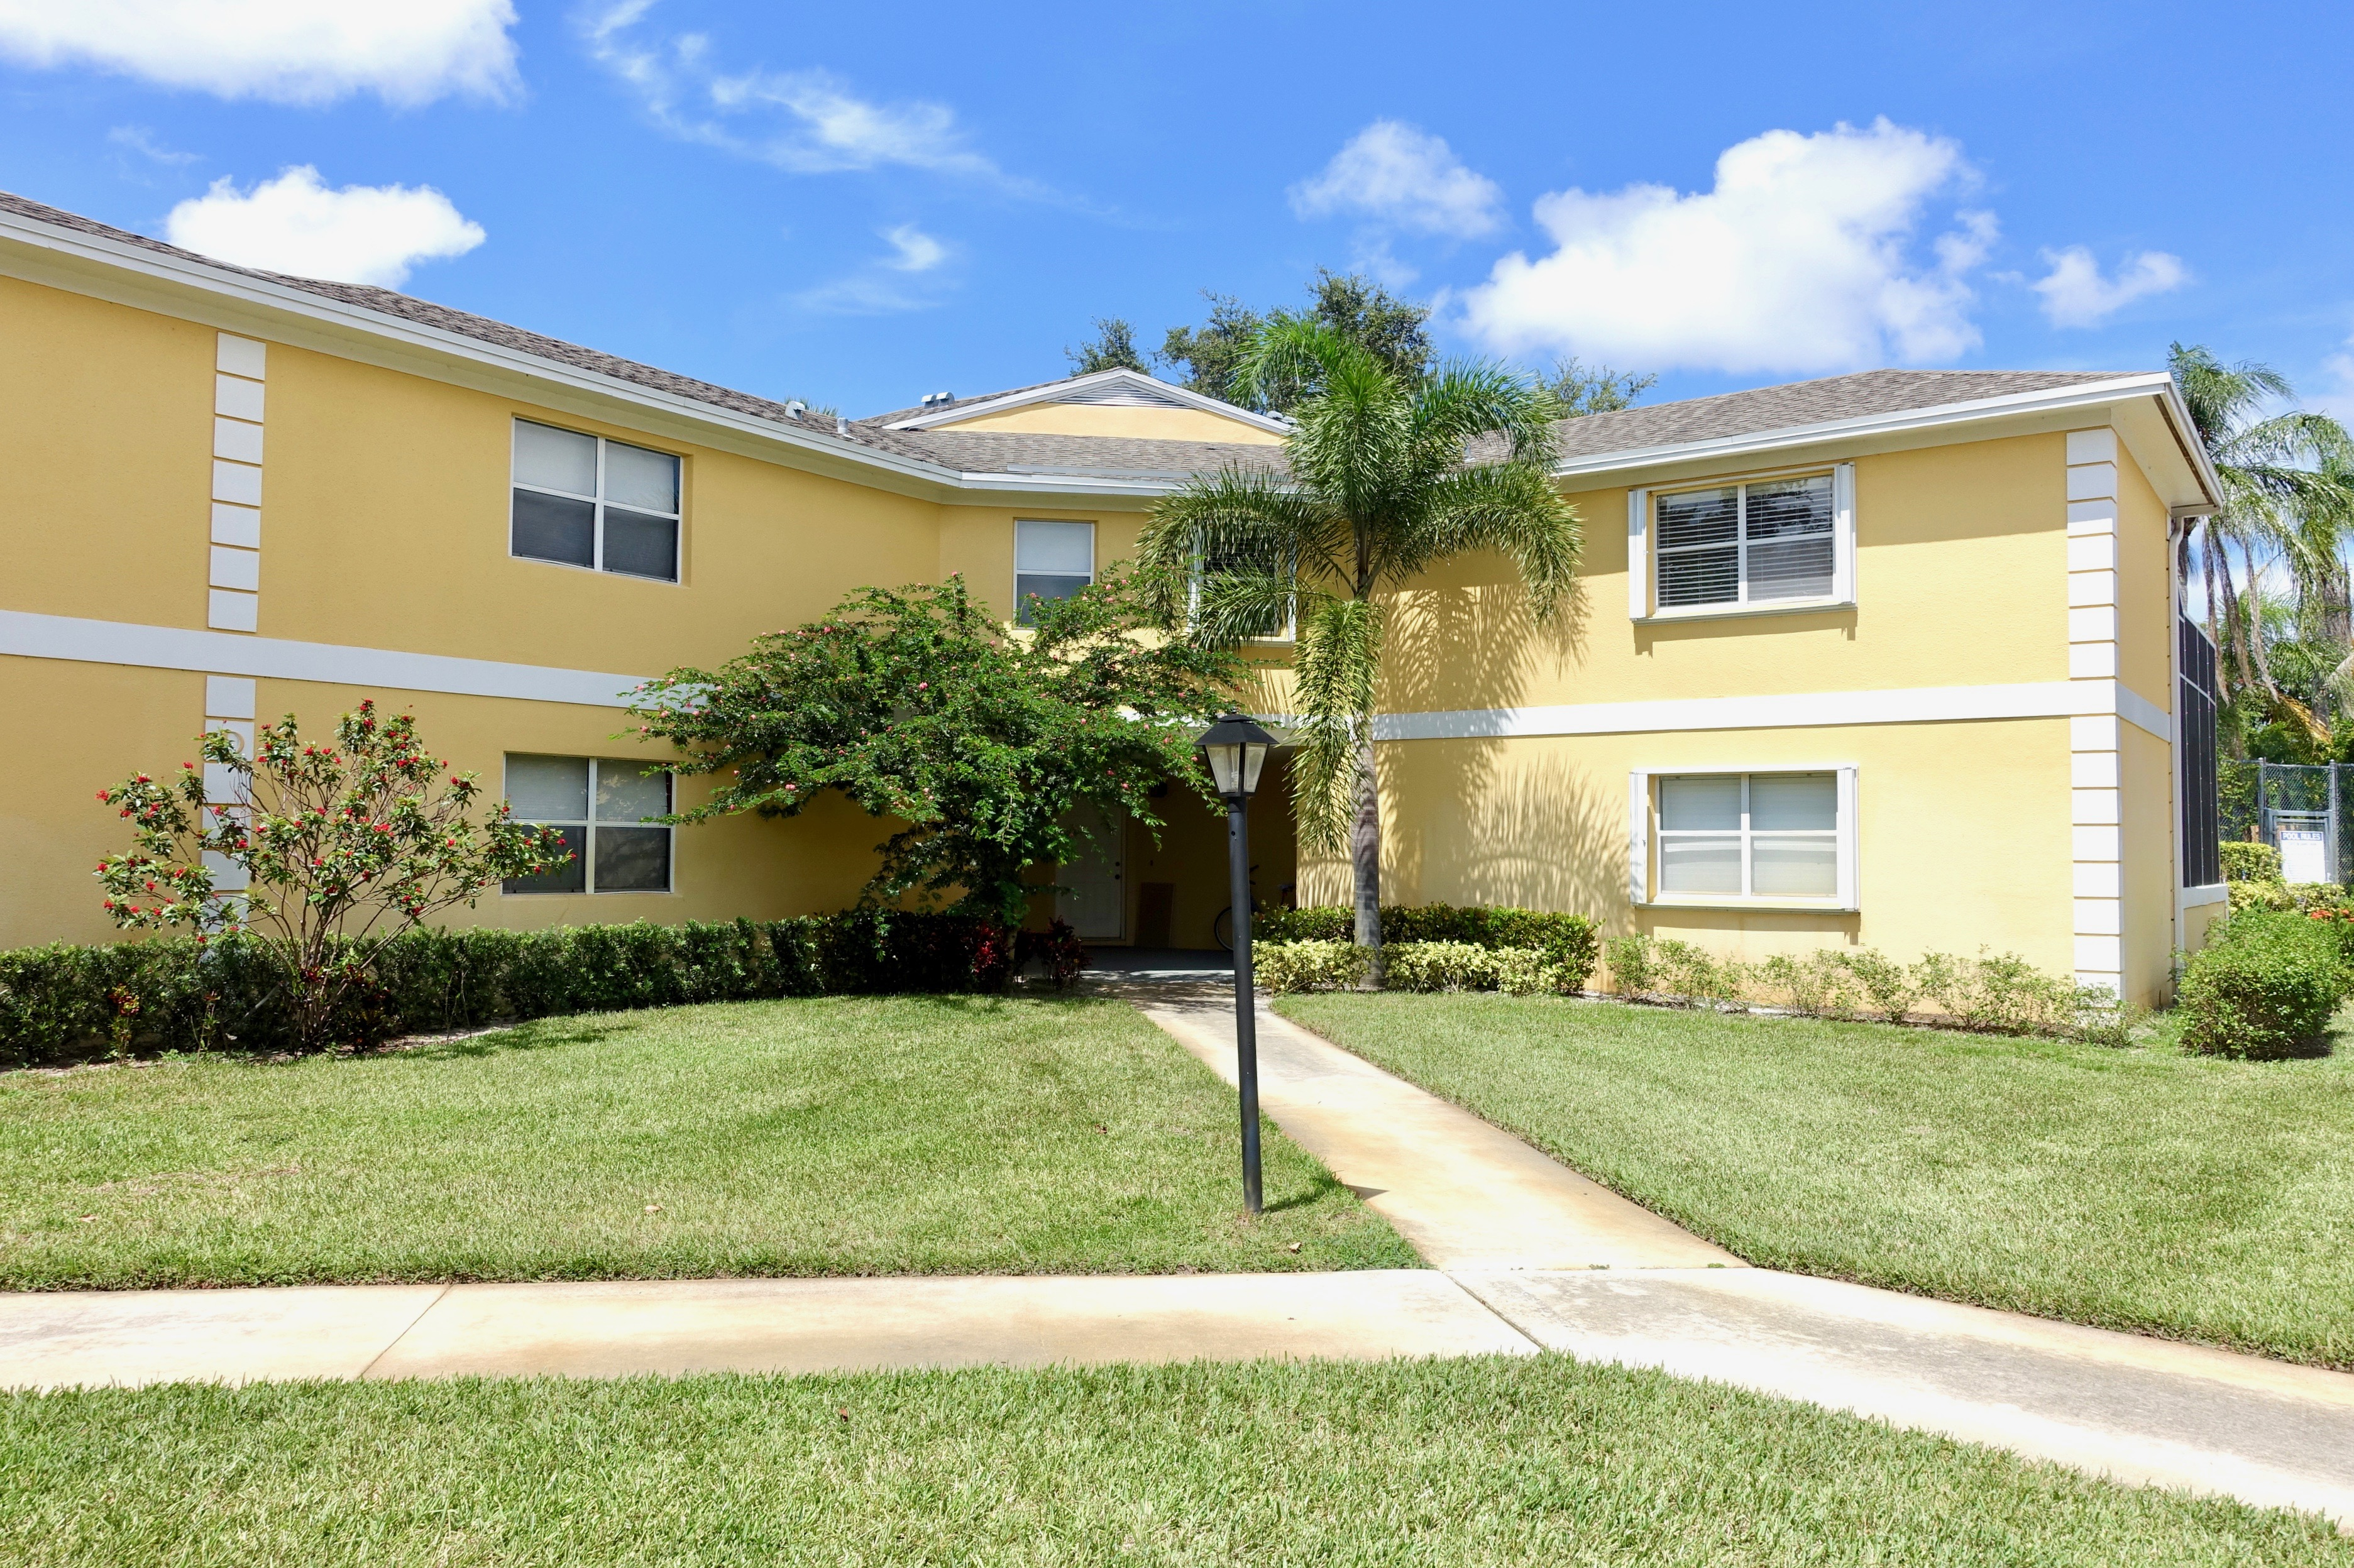 71 Beech Tree St., Stuart, FL 3494